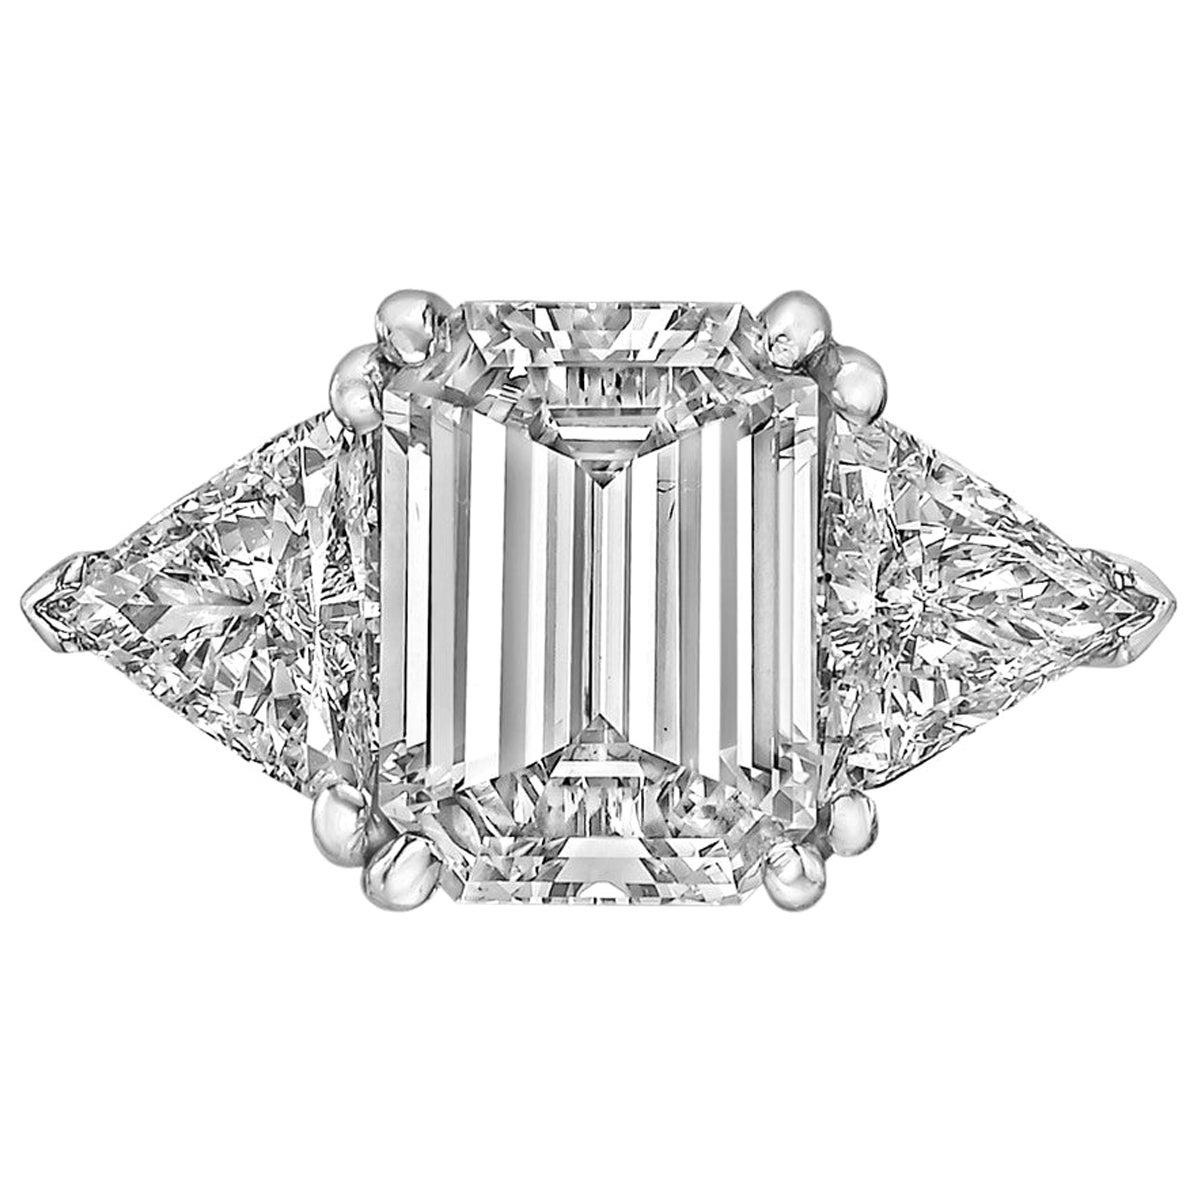 3.93 Carat Emerald-Cut Diamond Engagement Ring